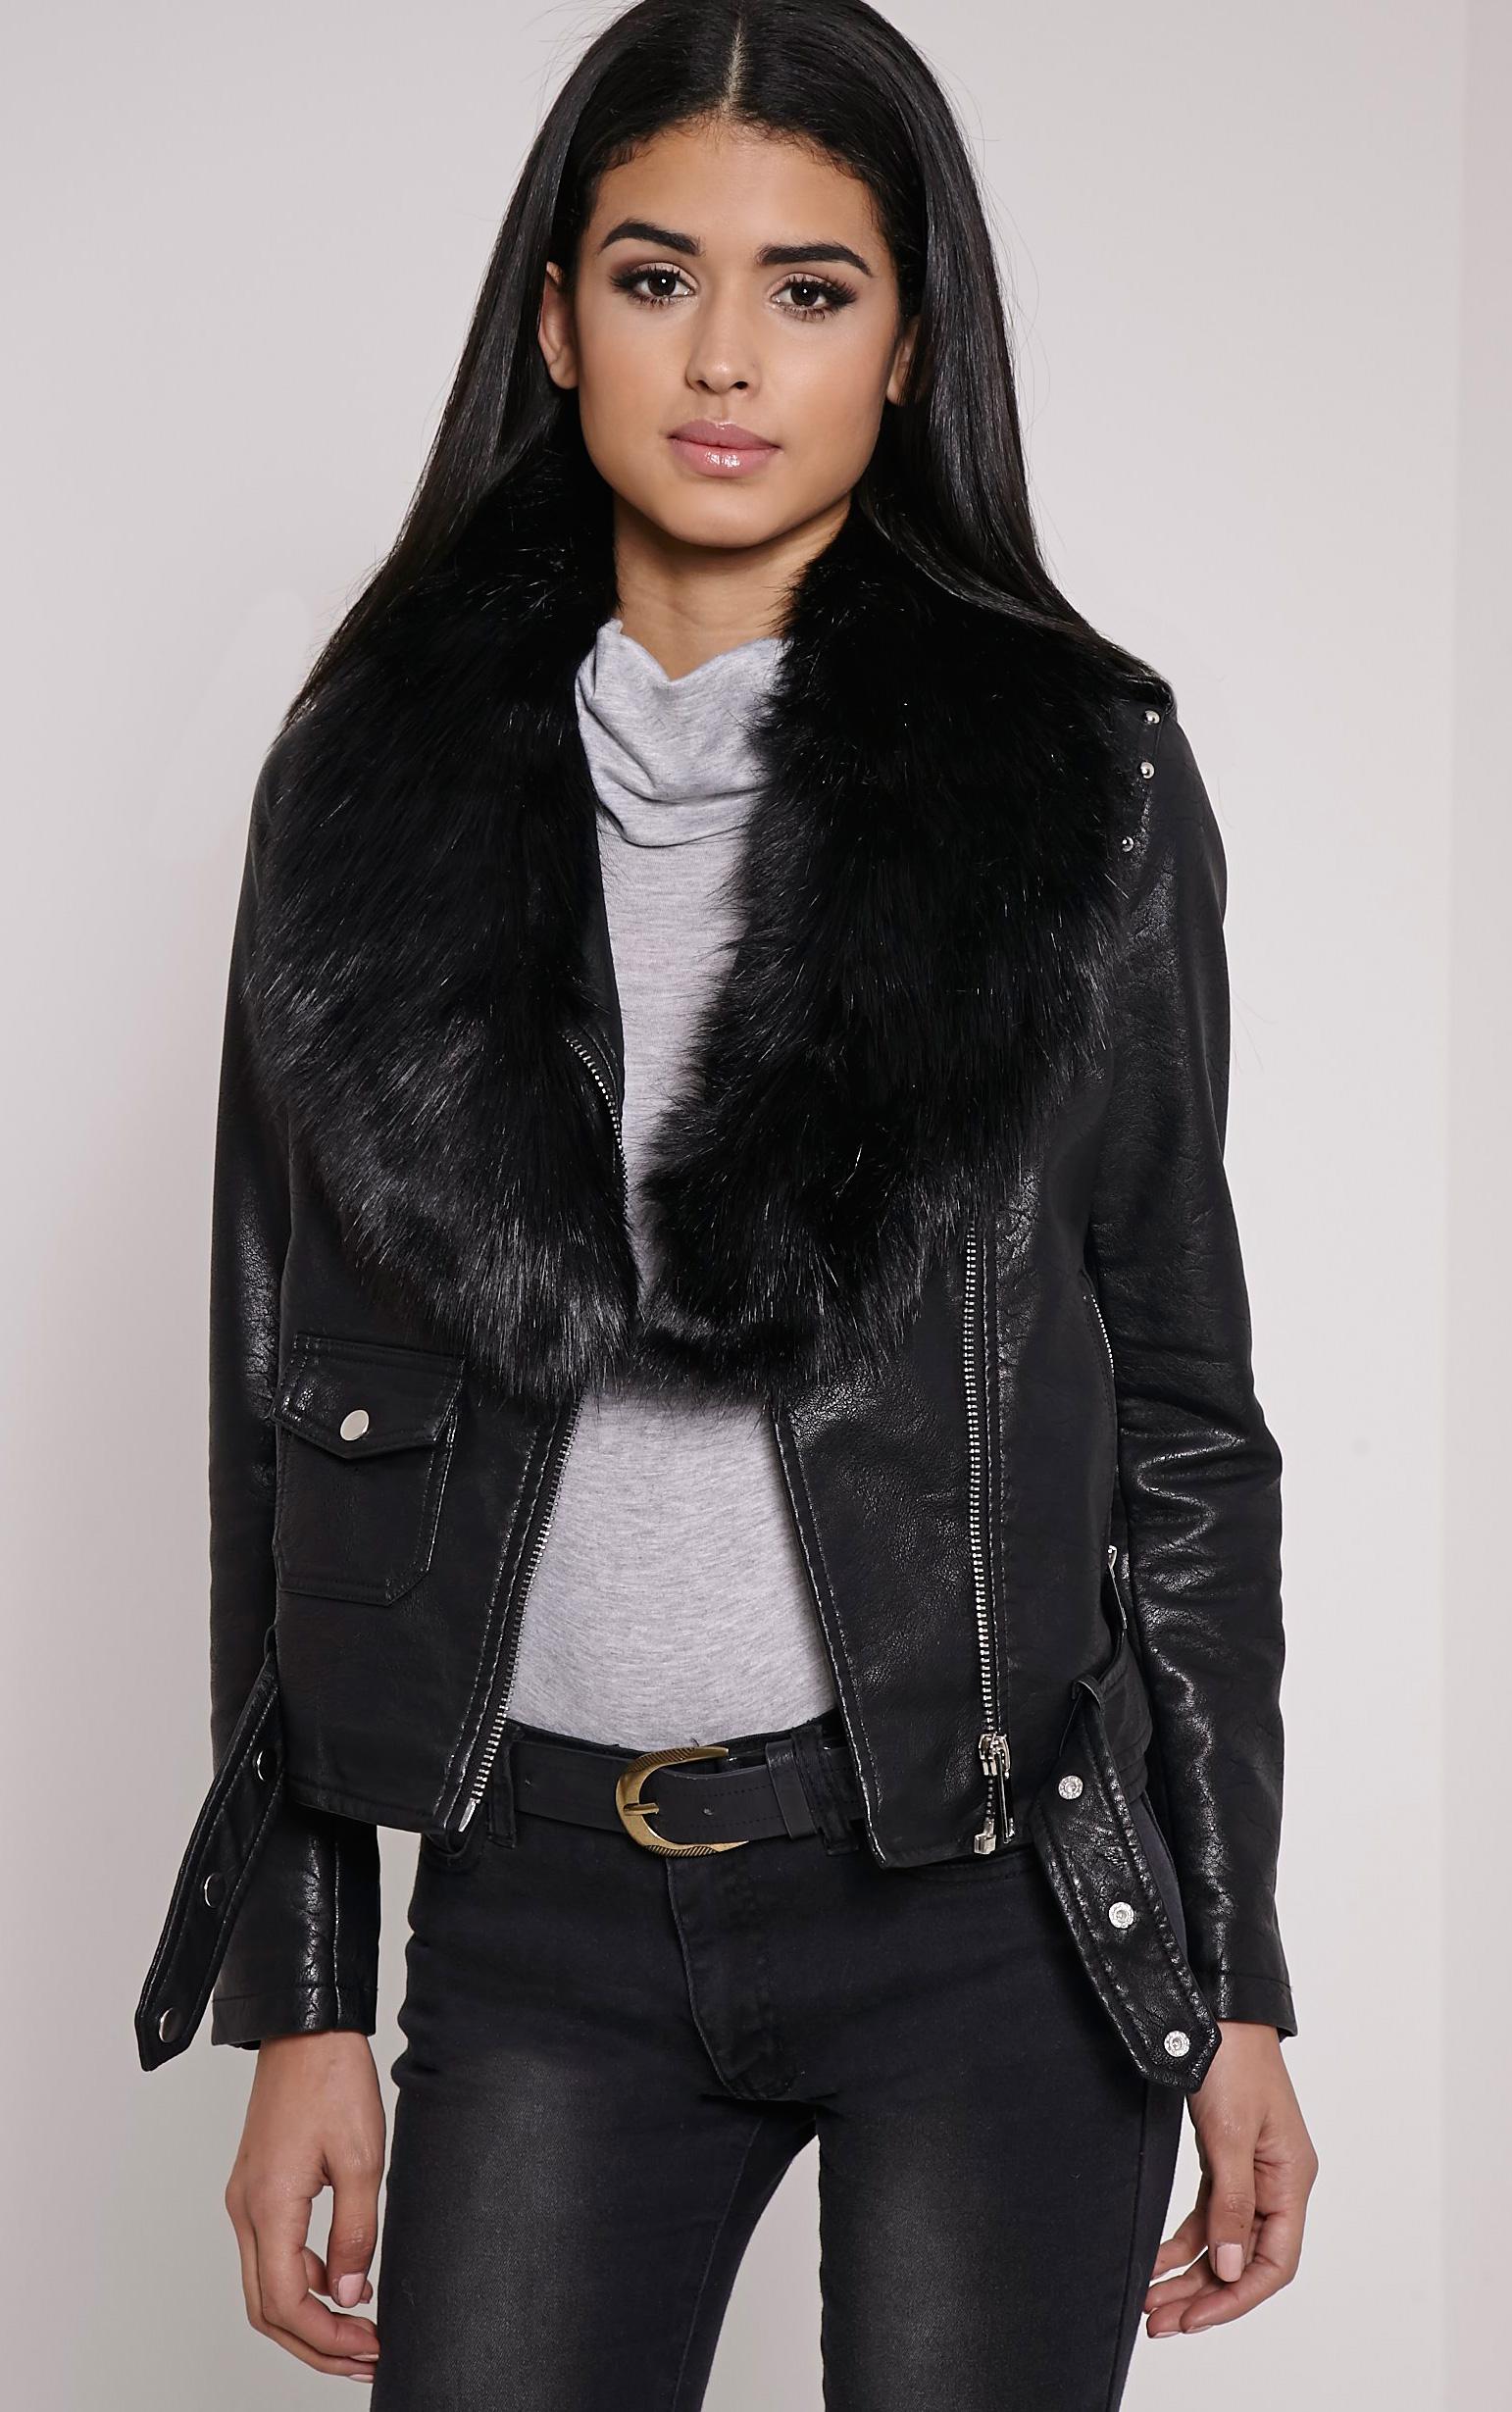 Kira Black Faux Fur Collar 1